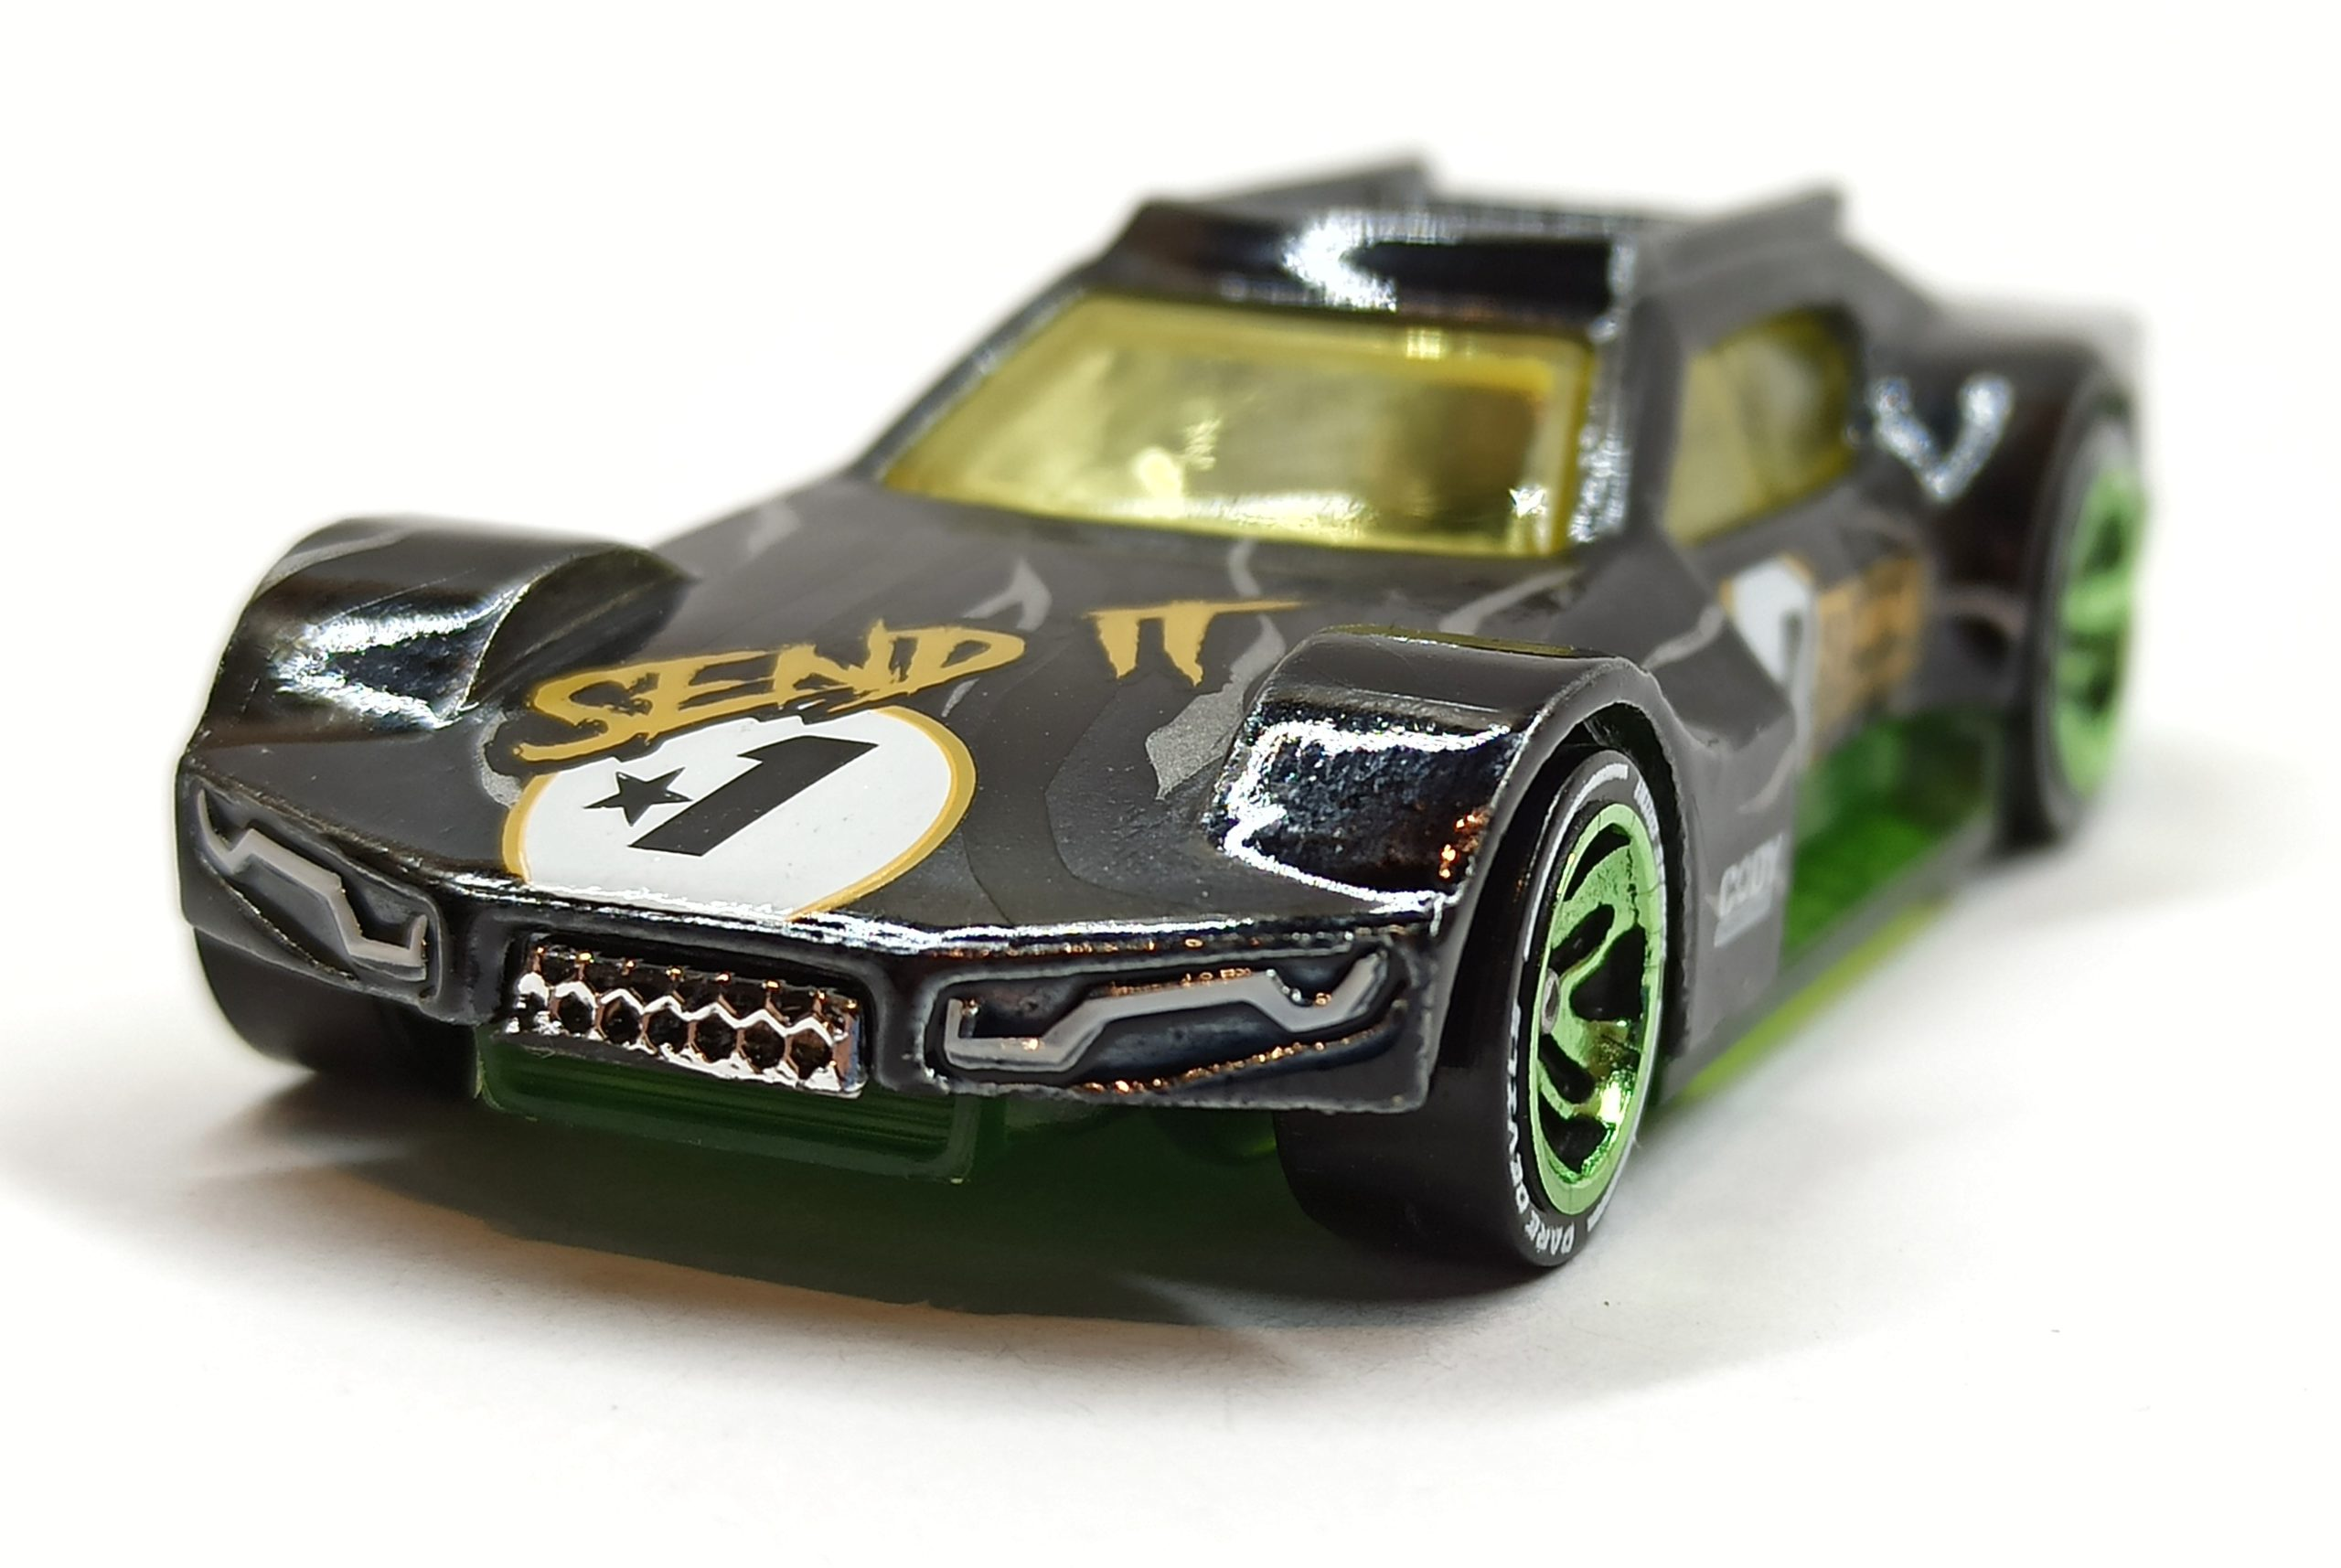 Hot Wheels Driftsta (GML16) 2021 Hot Wheels id: HW Daredevils (2/4) spectraflame black front angle